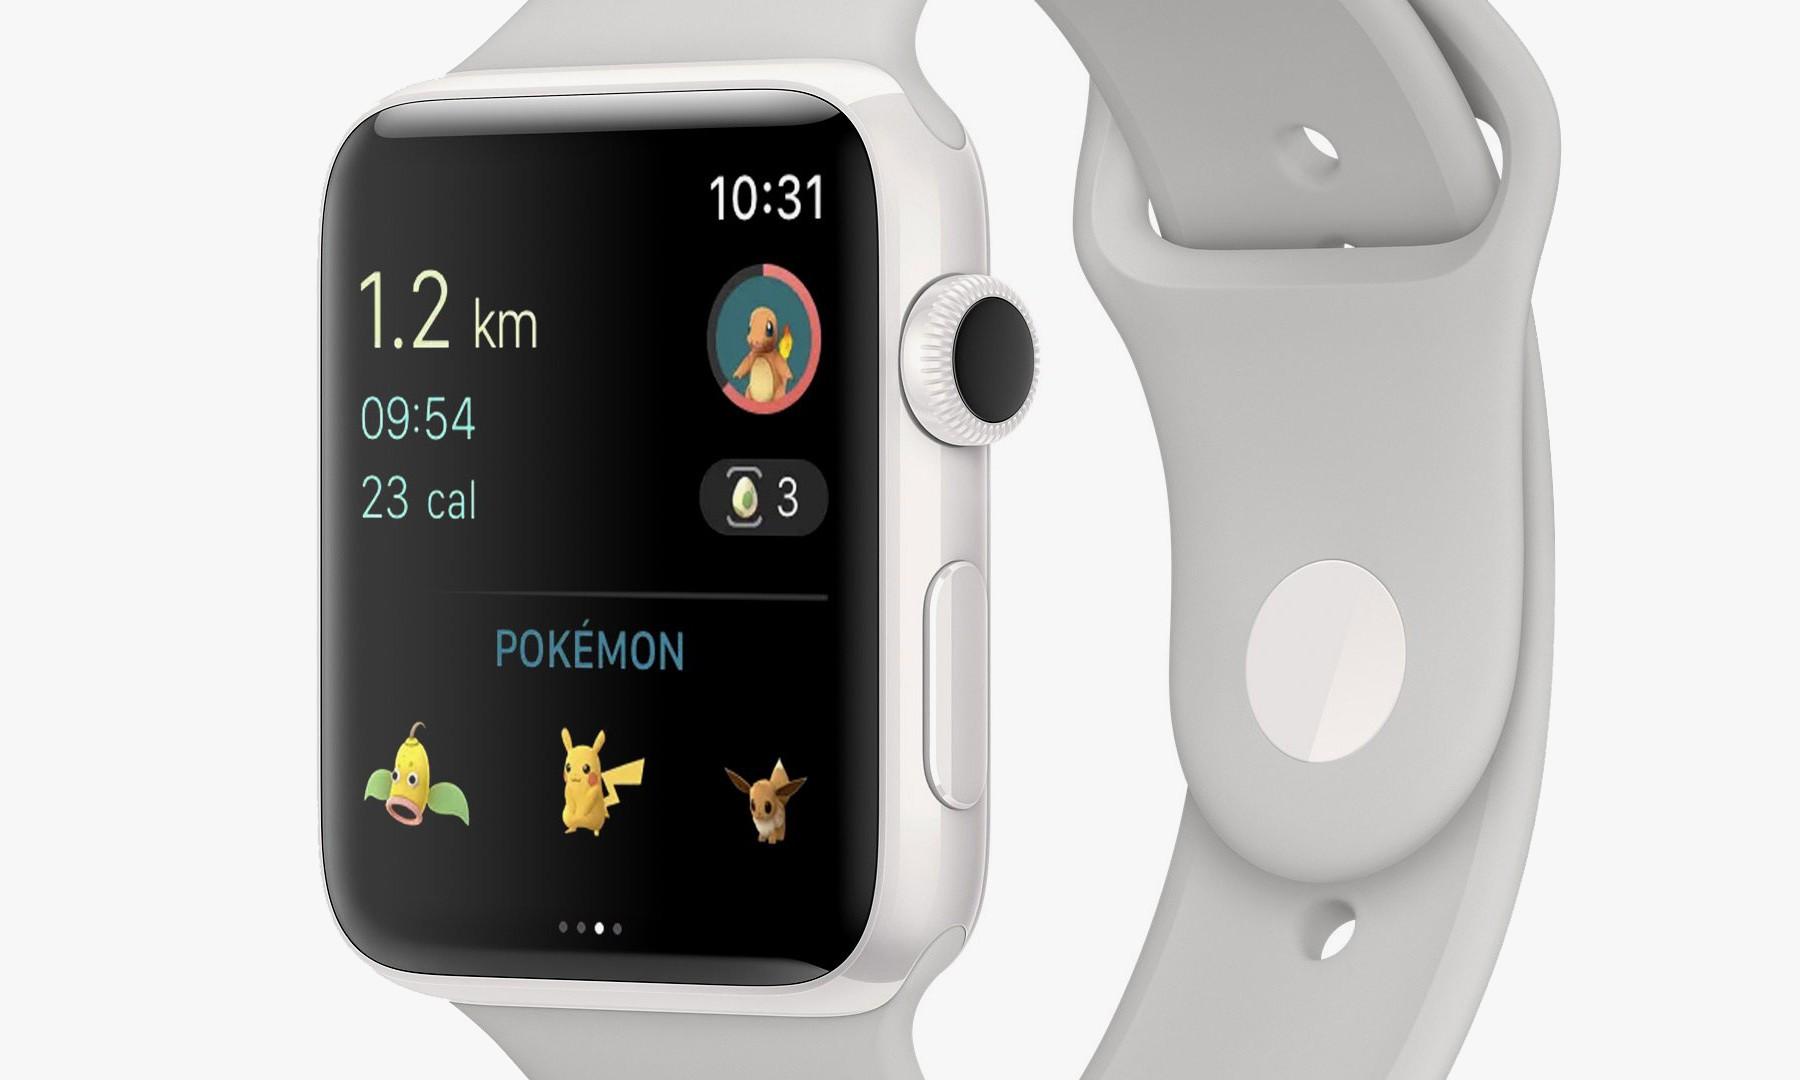 《Pokémon GO》现已登陆 Apple Watch